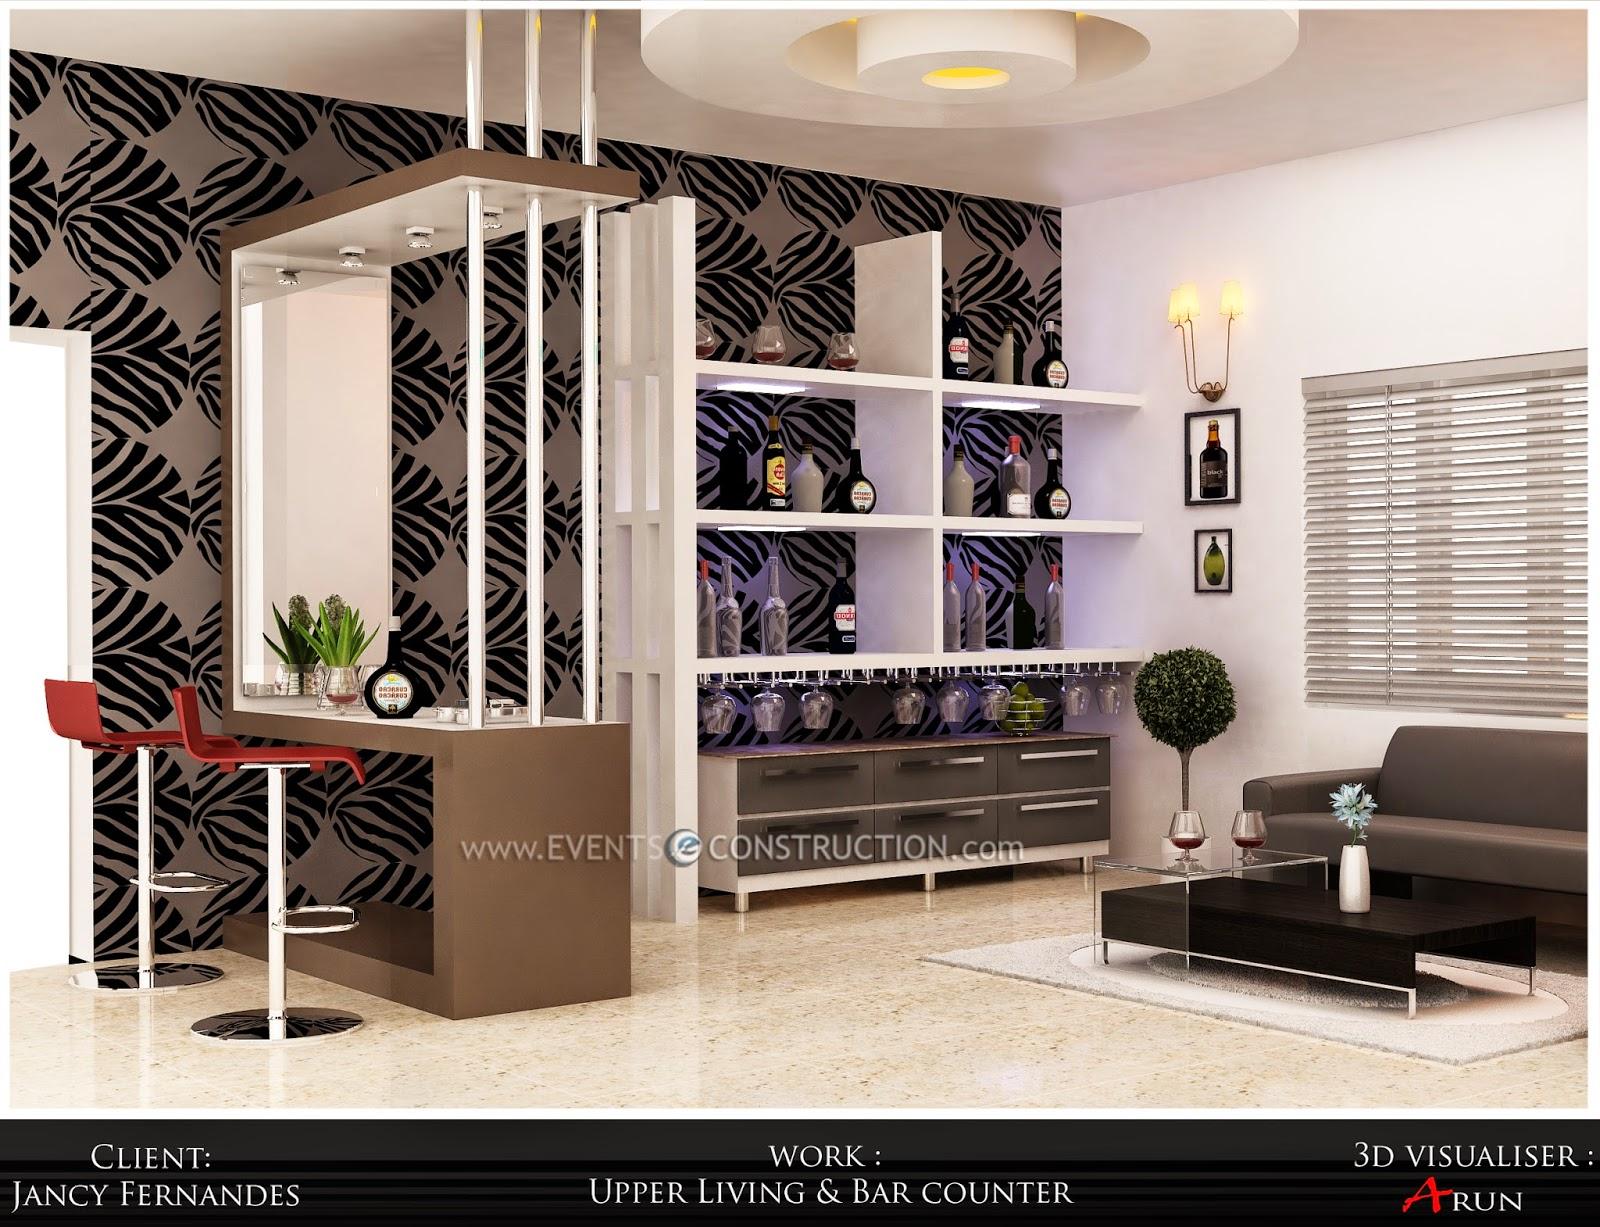 Evens Construction Pvt Ltd Upper living room and bar counter